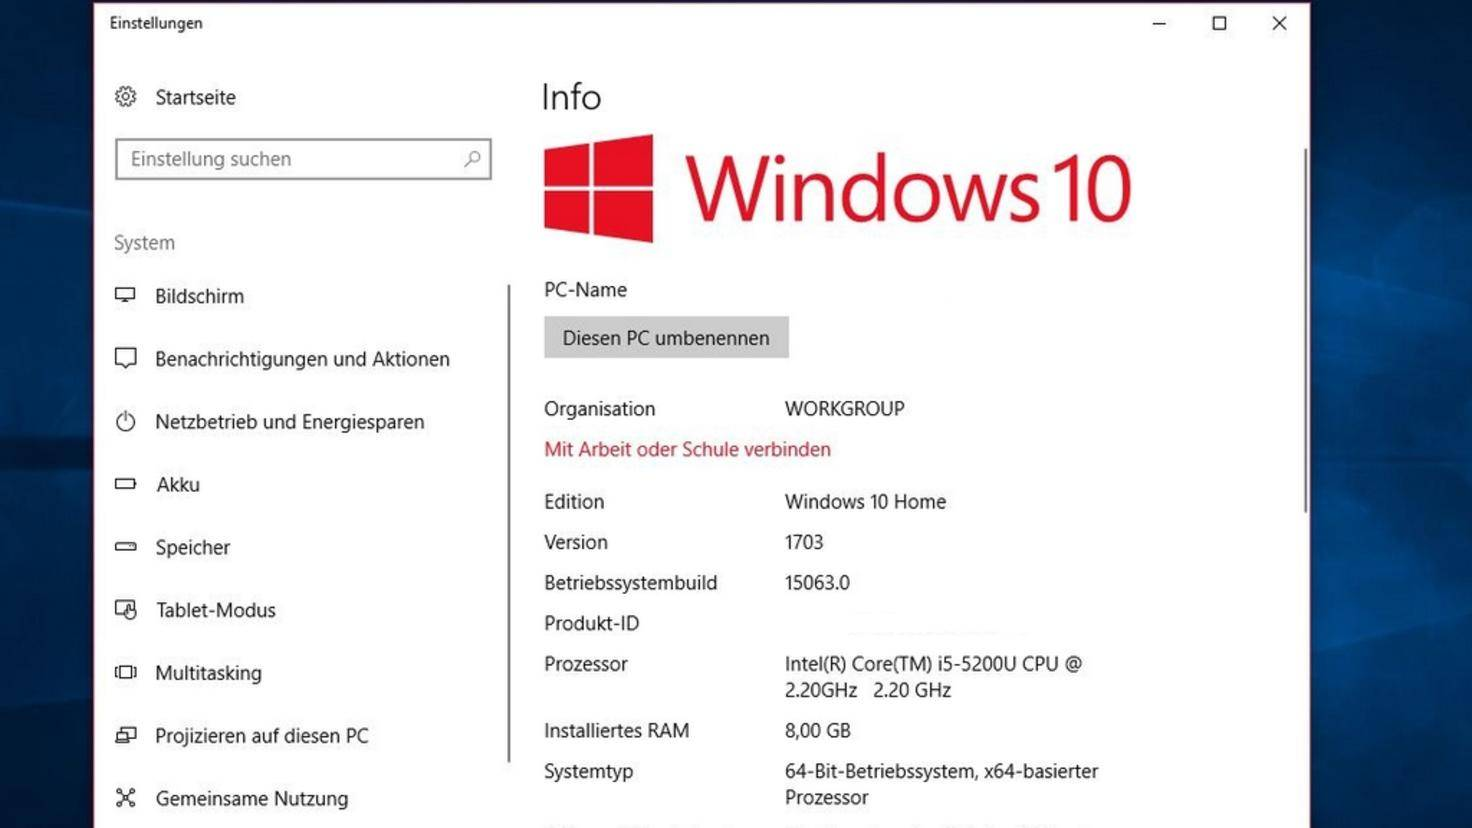 Windows 10 CA System